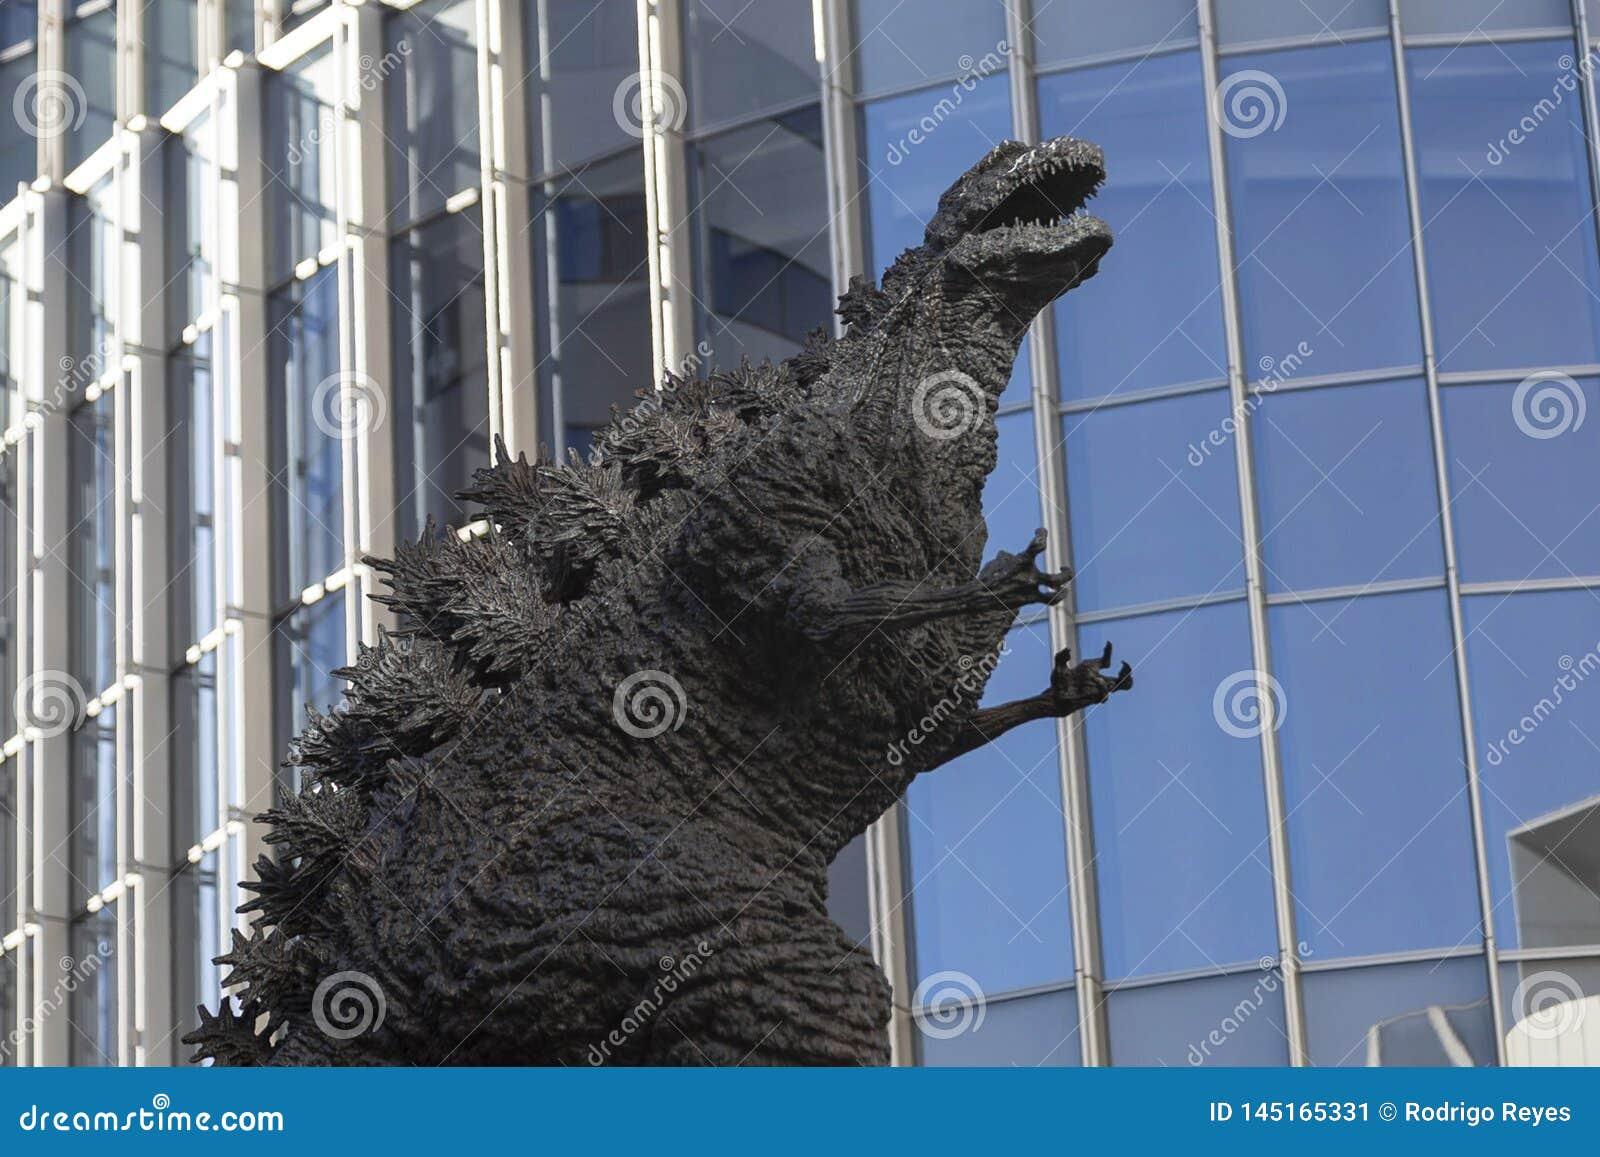 Godzilla statue in Hibiya